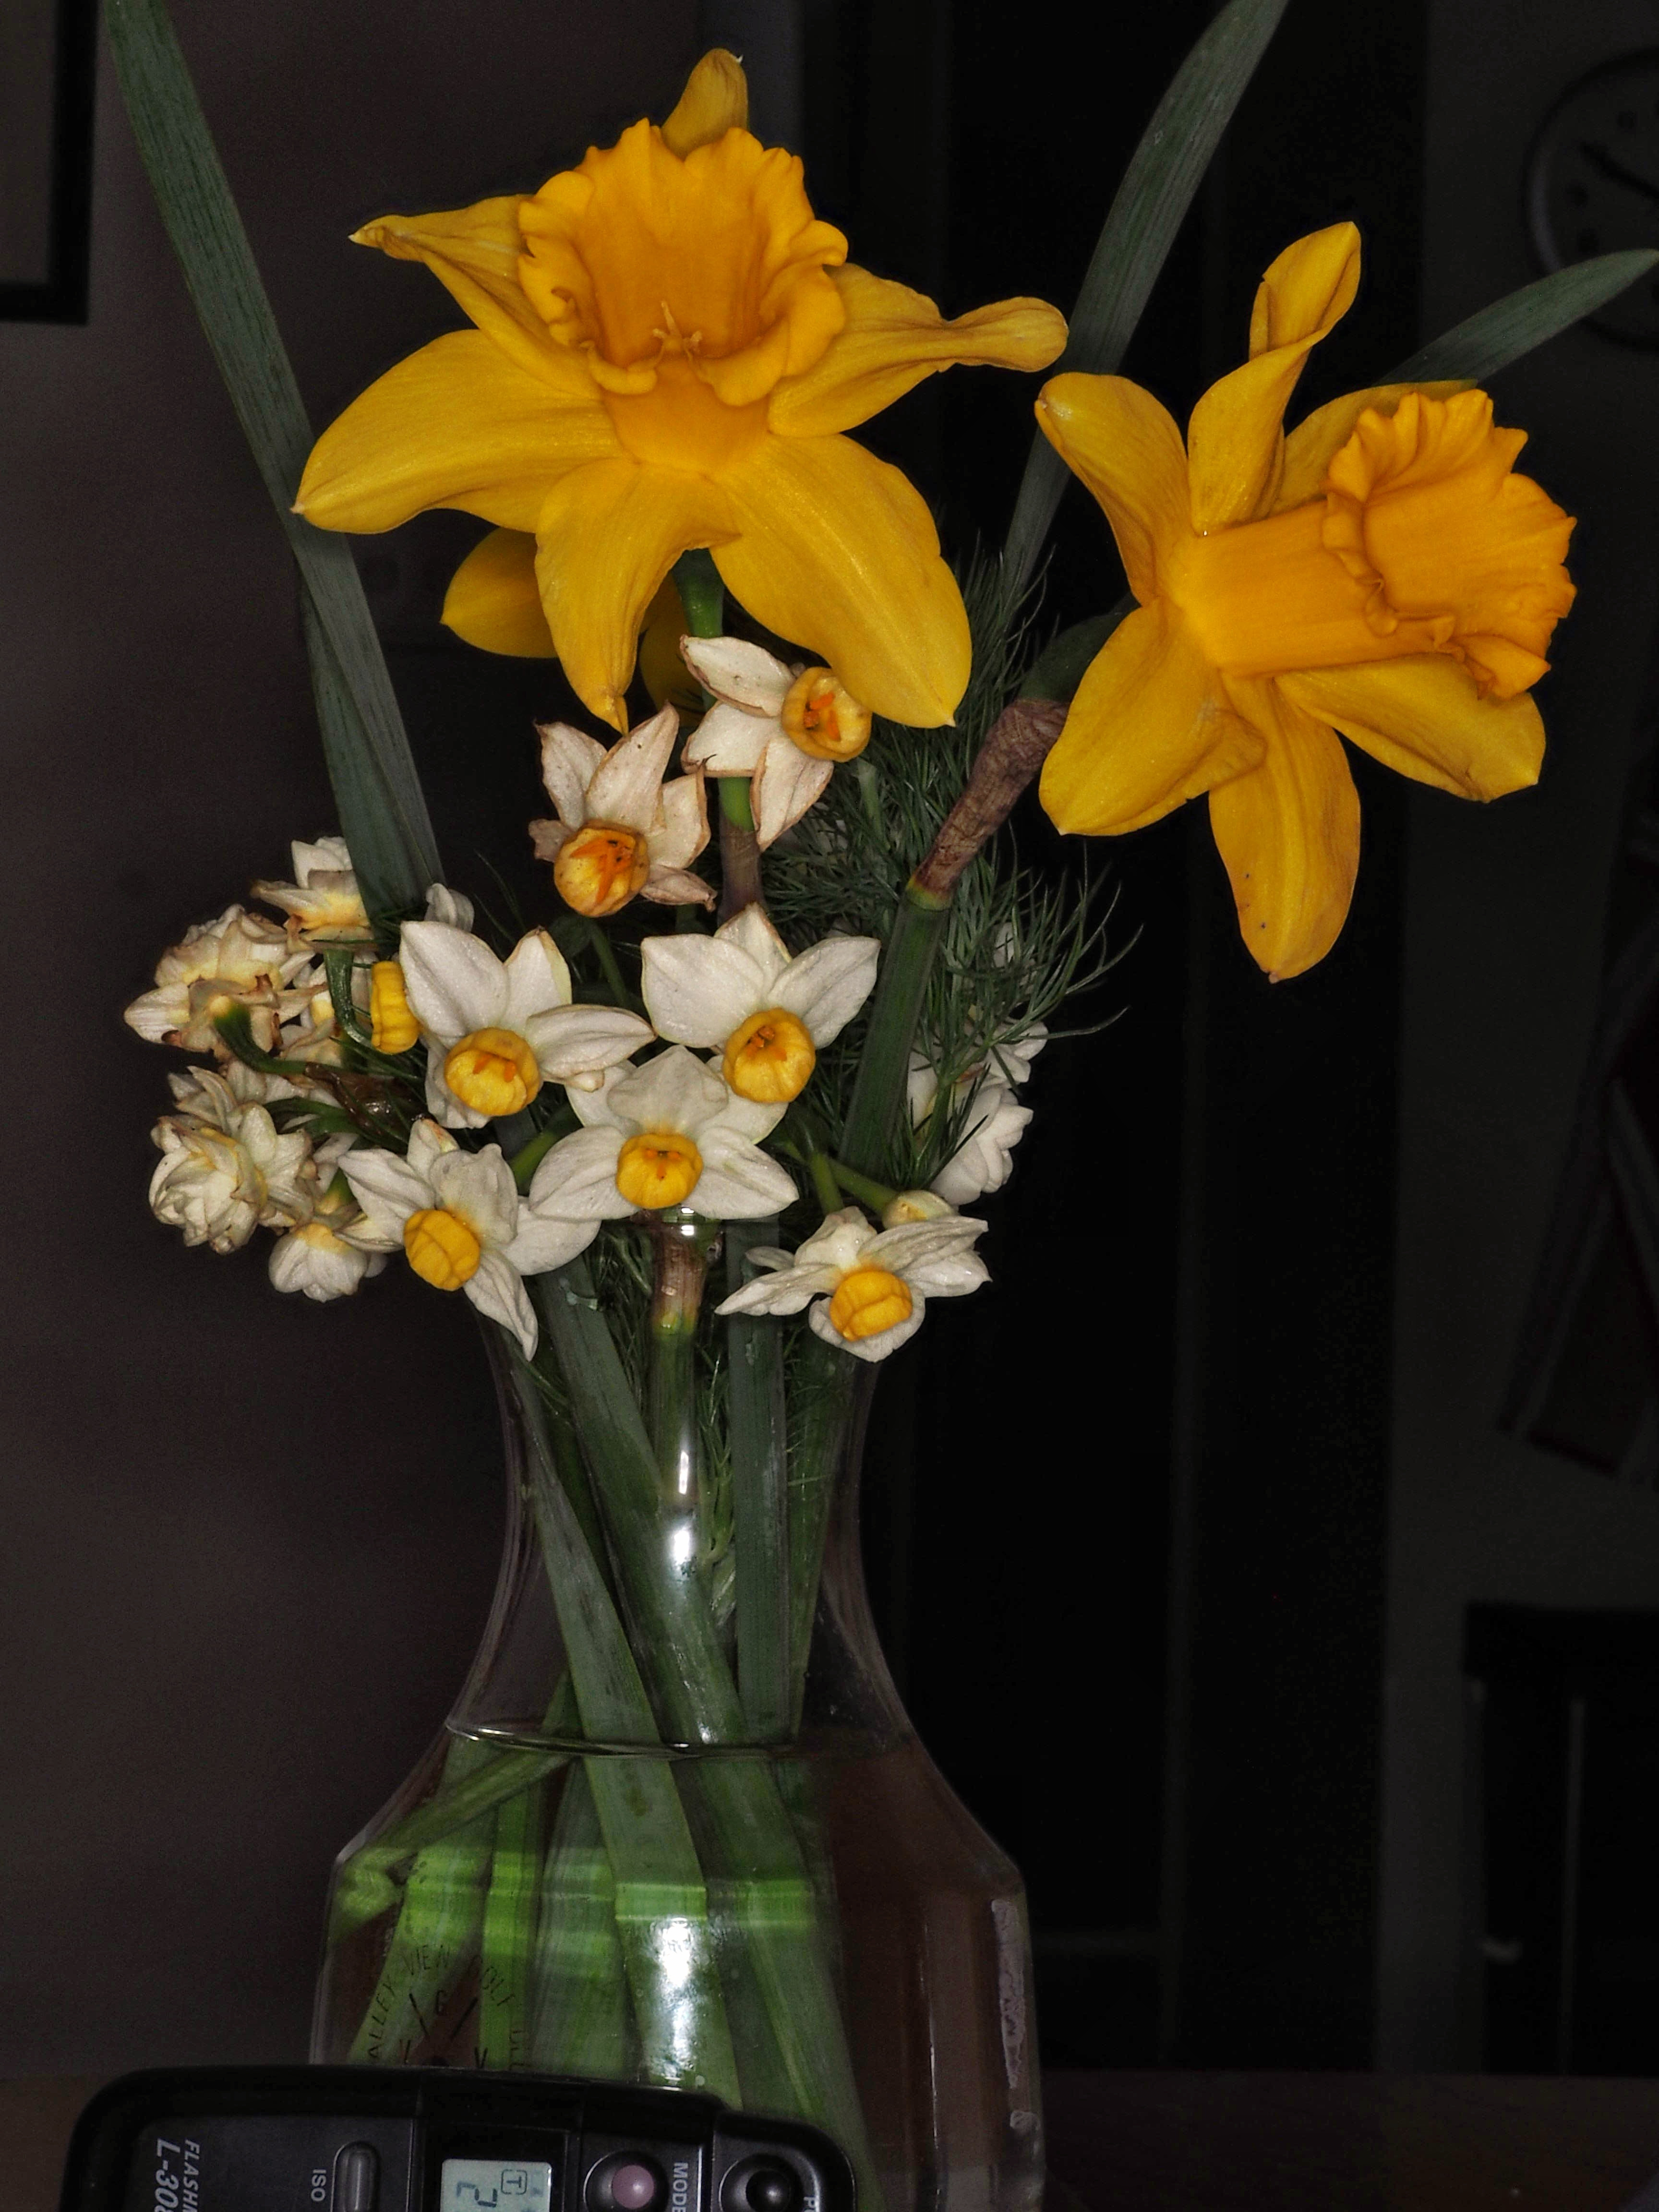 Narcissus-JPEG-2.jpeg